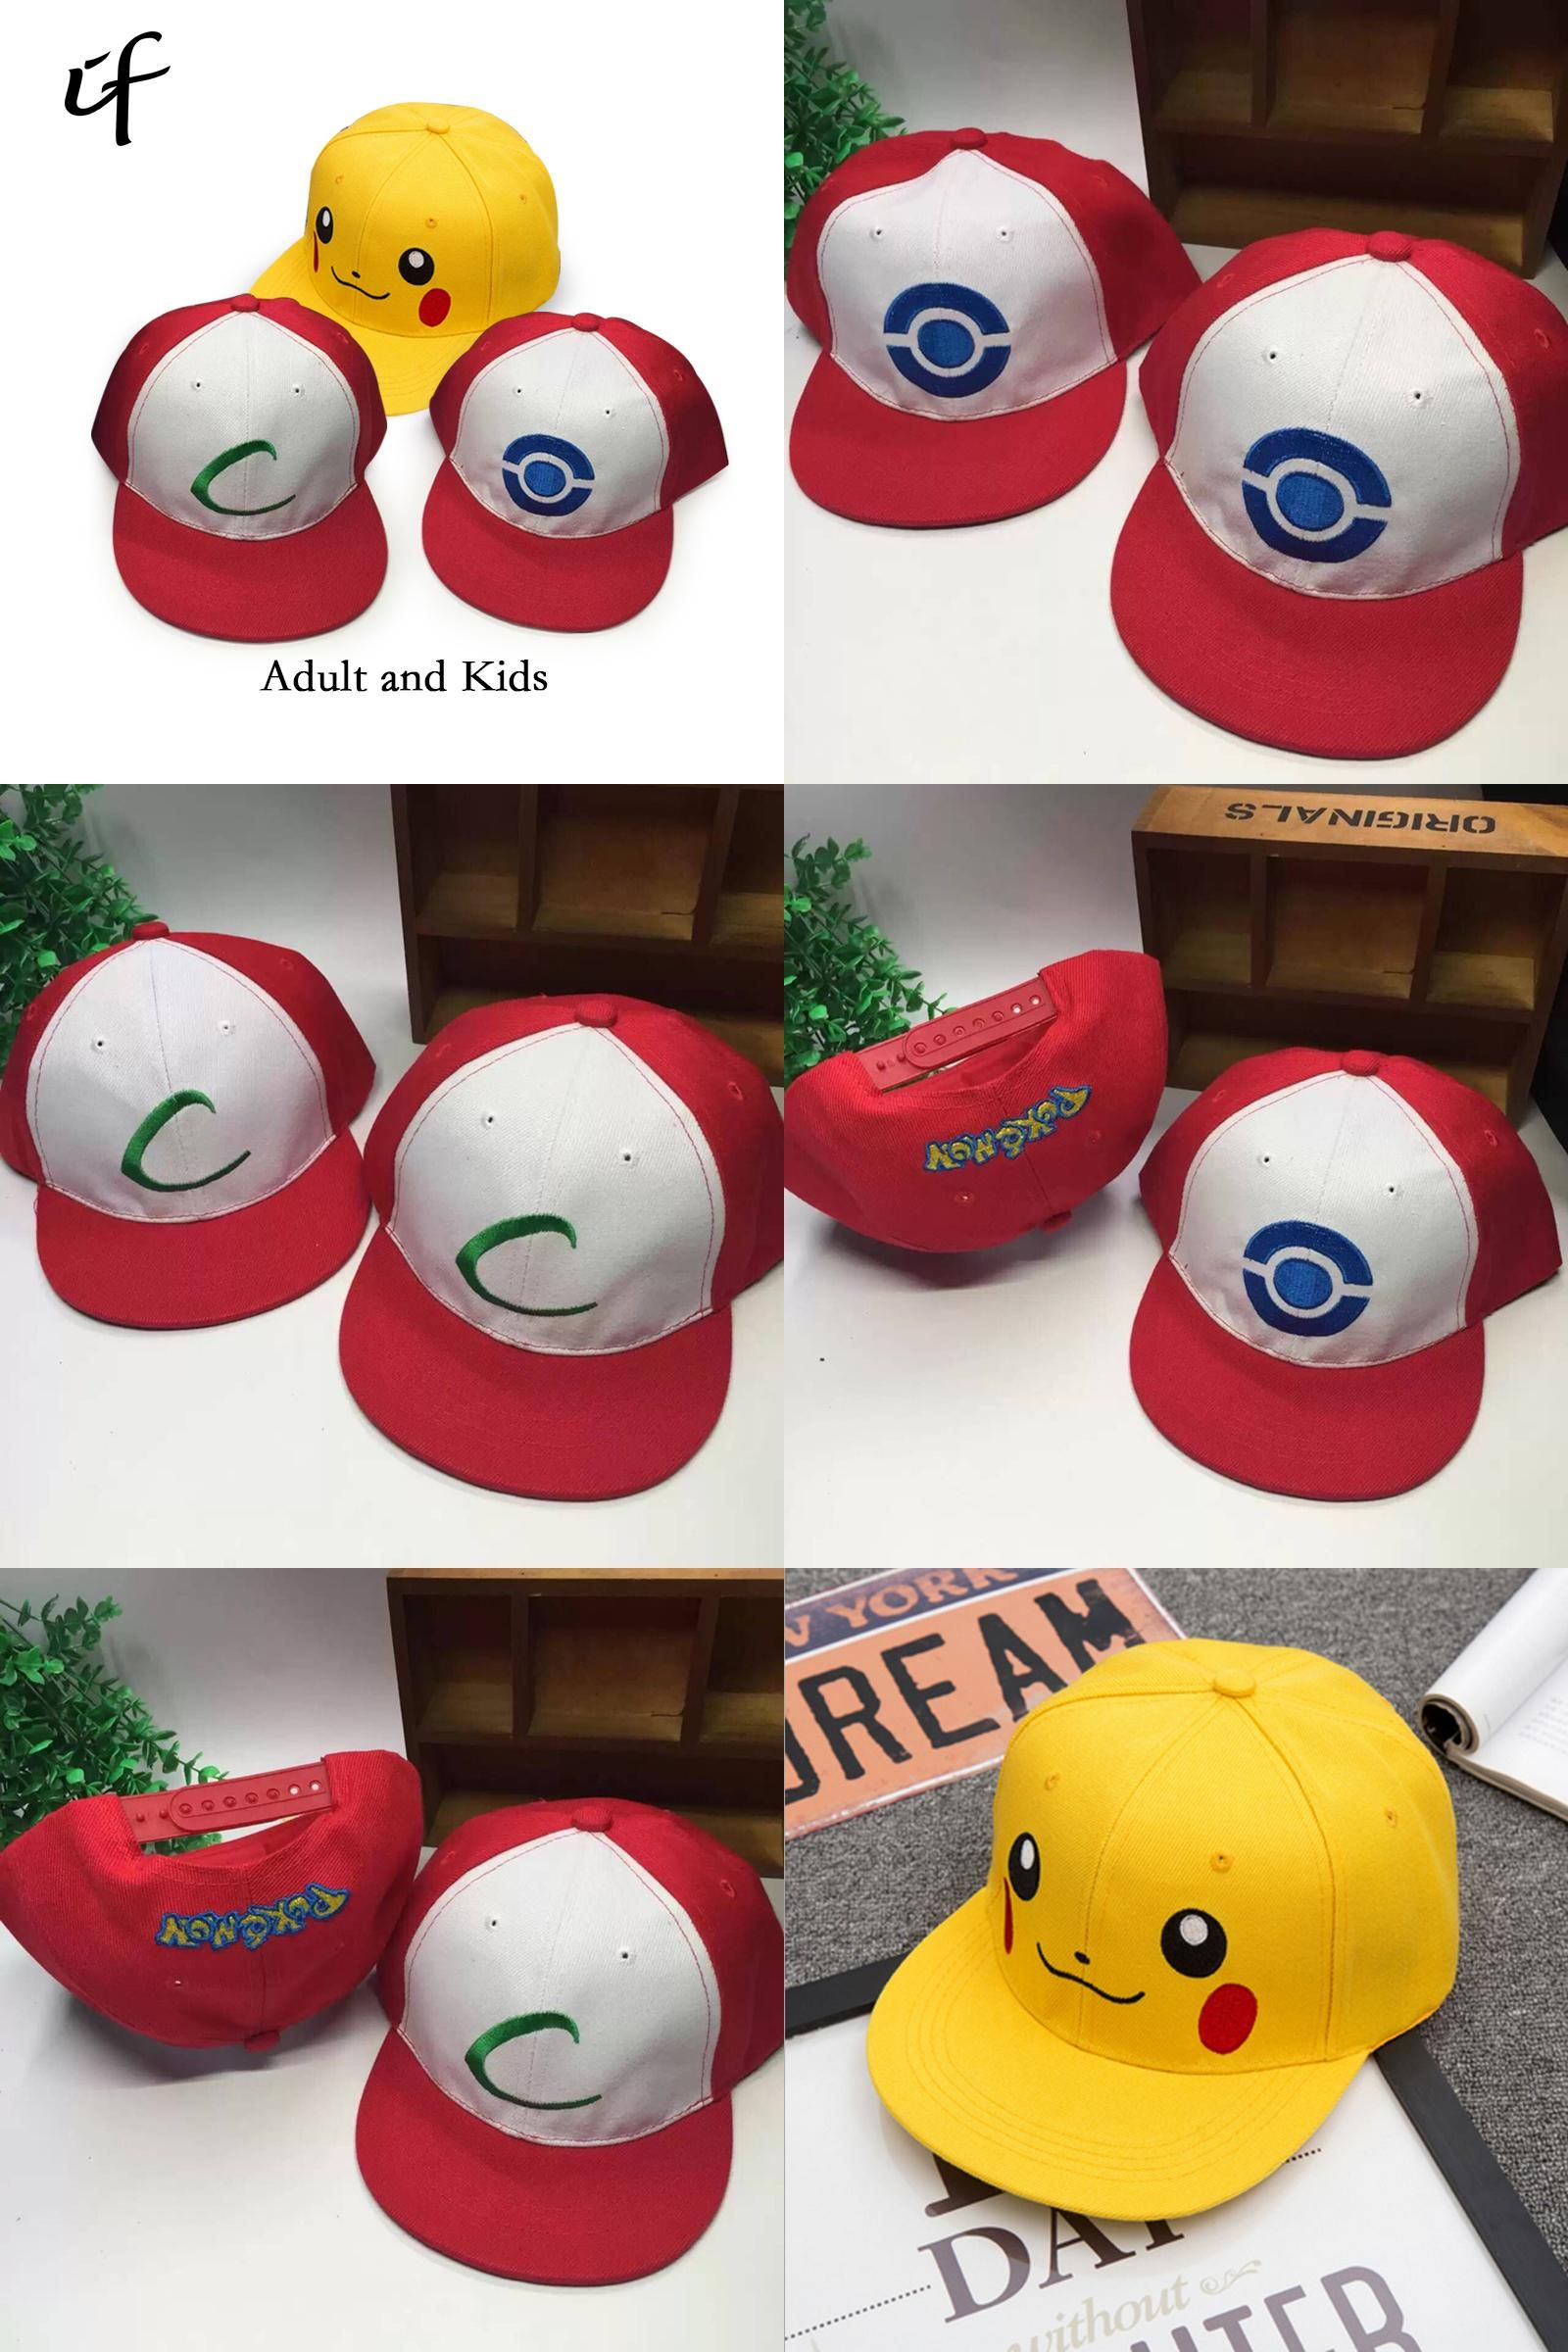 0bc9662ad14db  Visit to Buy  Kids Adult Pokemon Go Cosplay Cap Drake Hip Hop Pikachu  Pocket Monster Bone Dad Hat Baseball Caps Charms Ash Ketchum Casquette   Advertisement